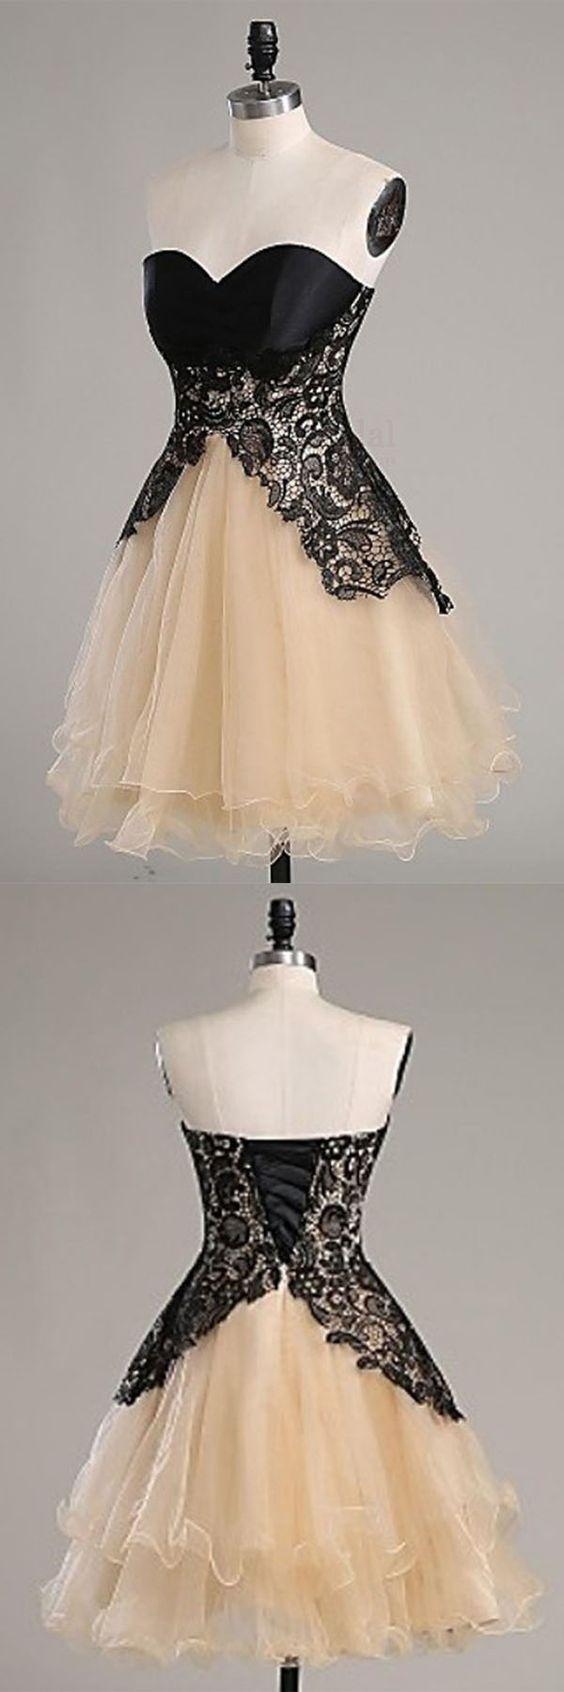 Black lace prom dresssweatheart neck prom dresshomecoming dress